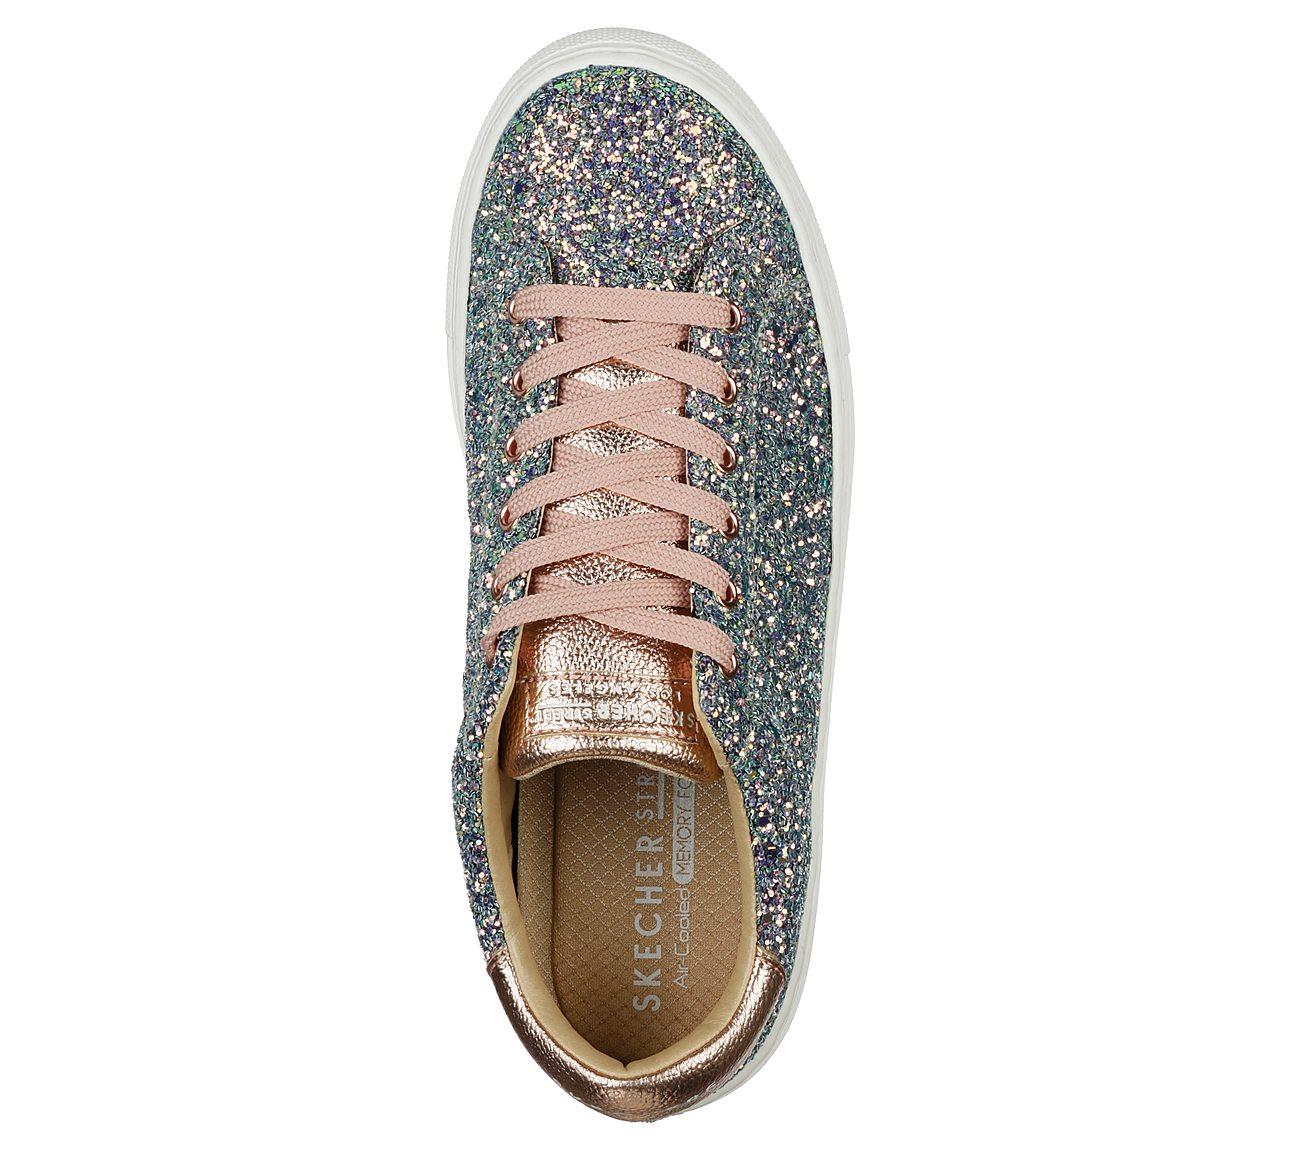 0d195afa07e1 Buy SKECHERS Side Street - Awesome Sauce SKECHER Street Shoes only ...